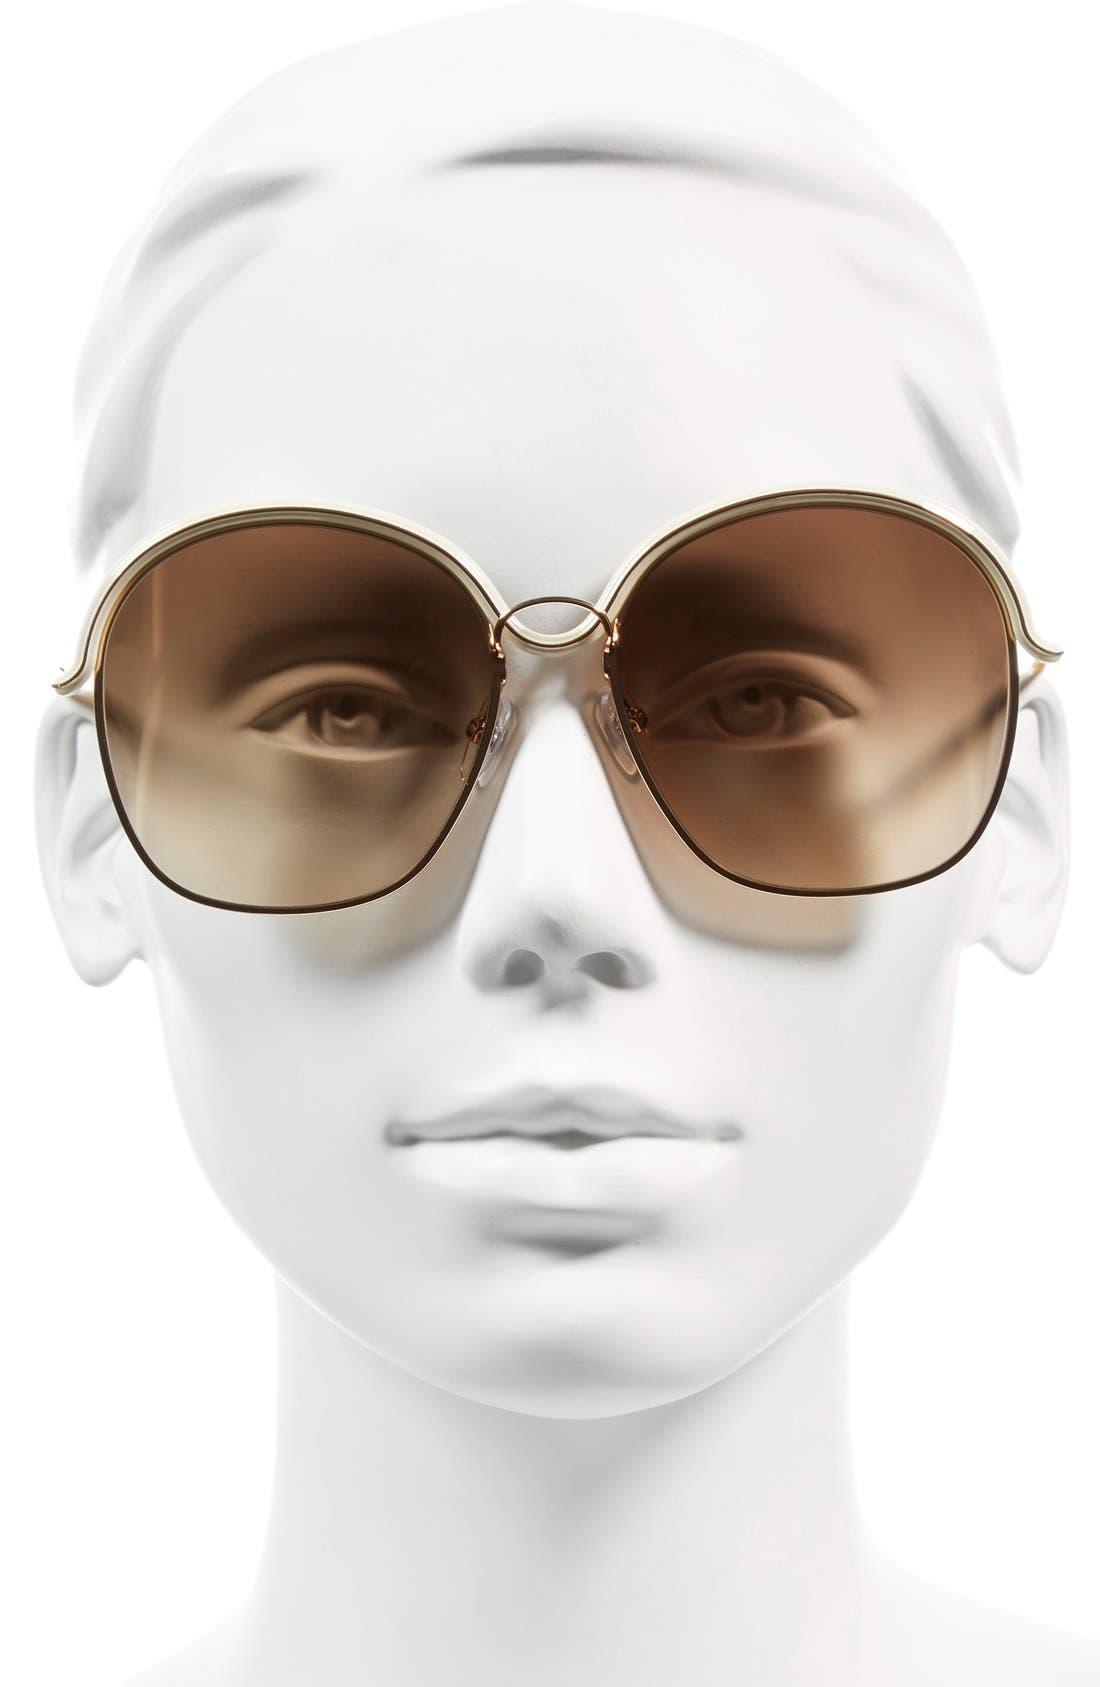 7030/S 58mm Oversized Sunglasses,                             Alternate thumbnail 2, color,                             Gold/ Beige